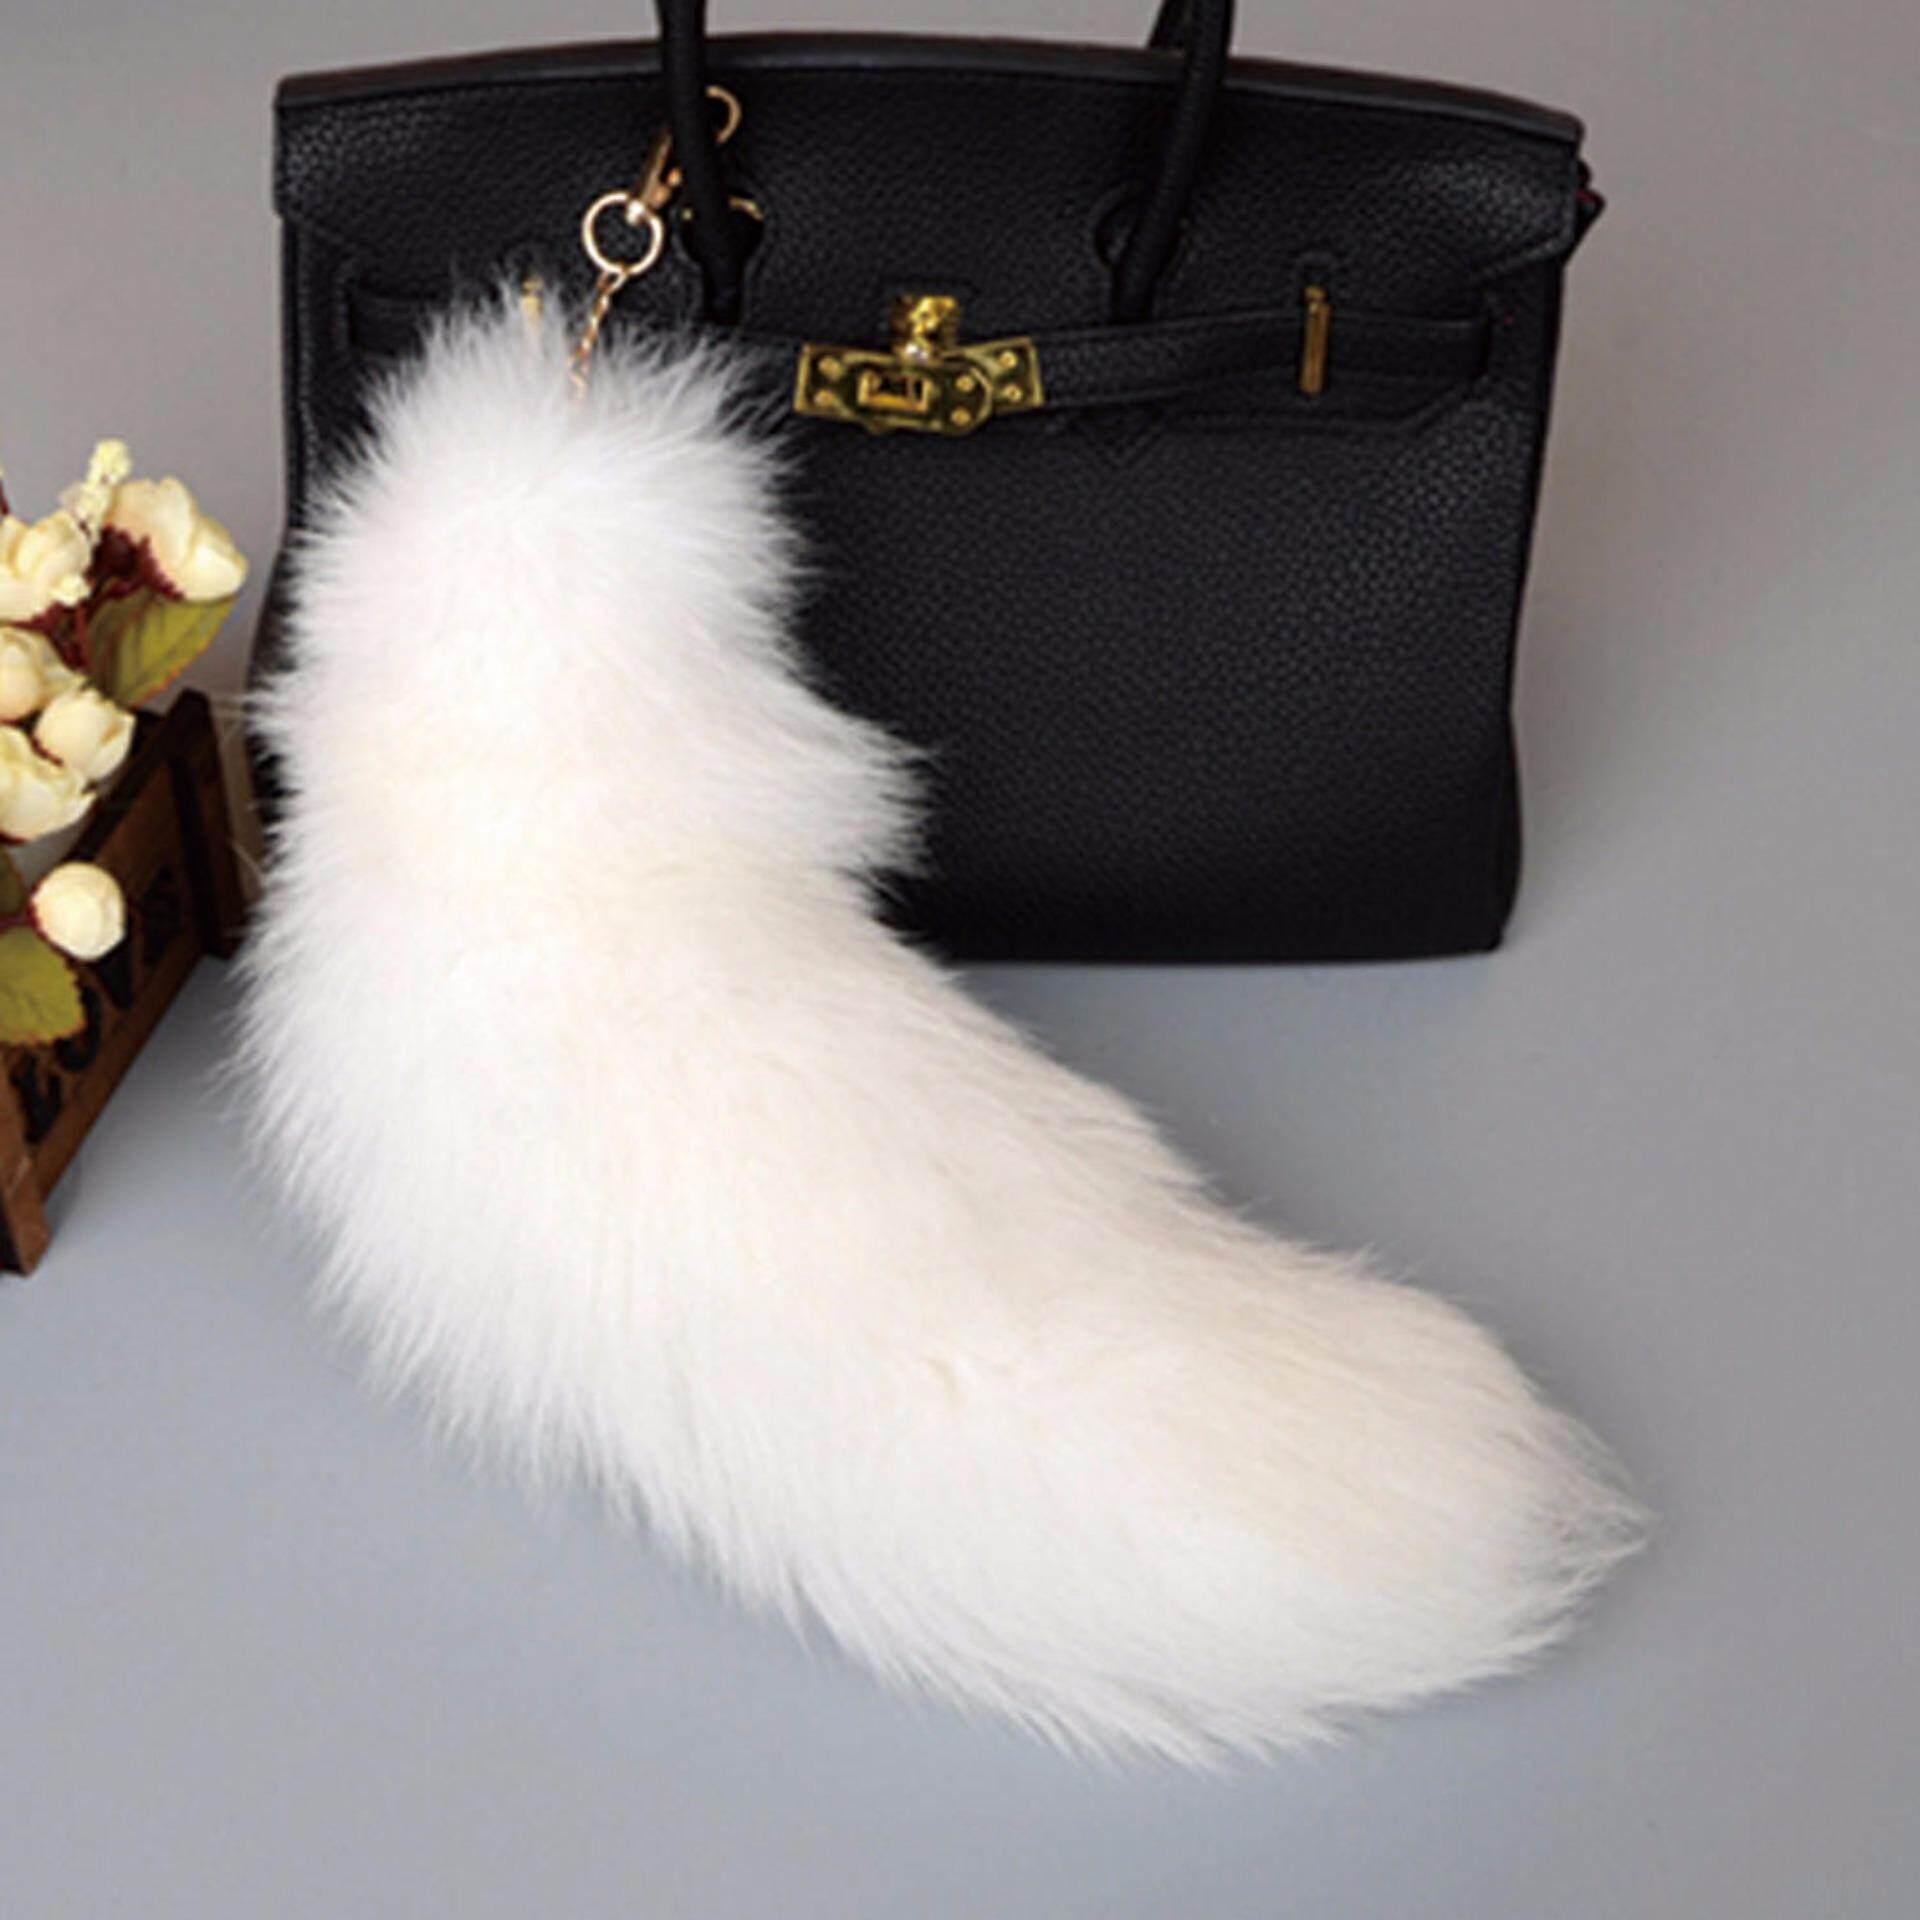 Fancyqube Arctic Fox Tail Fur Keychain Car Bag Charm Key Ring Hook Gift H02-Intl